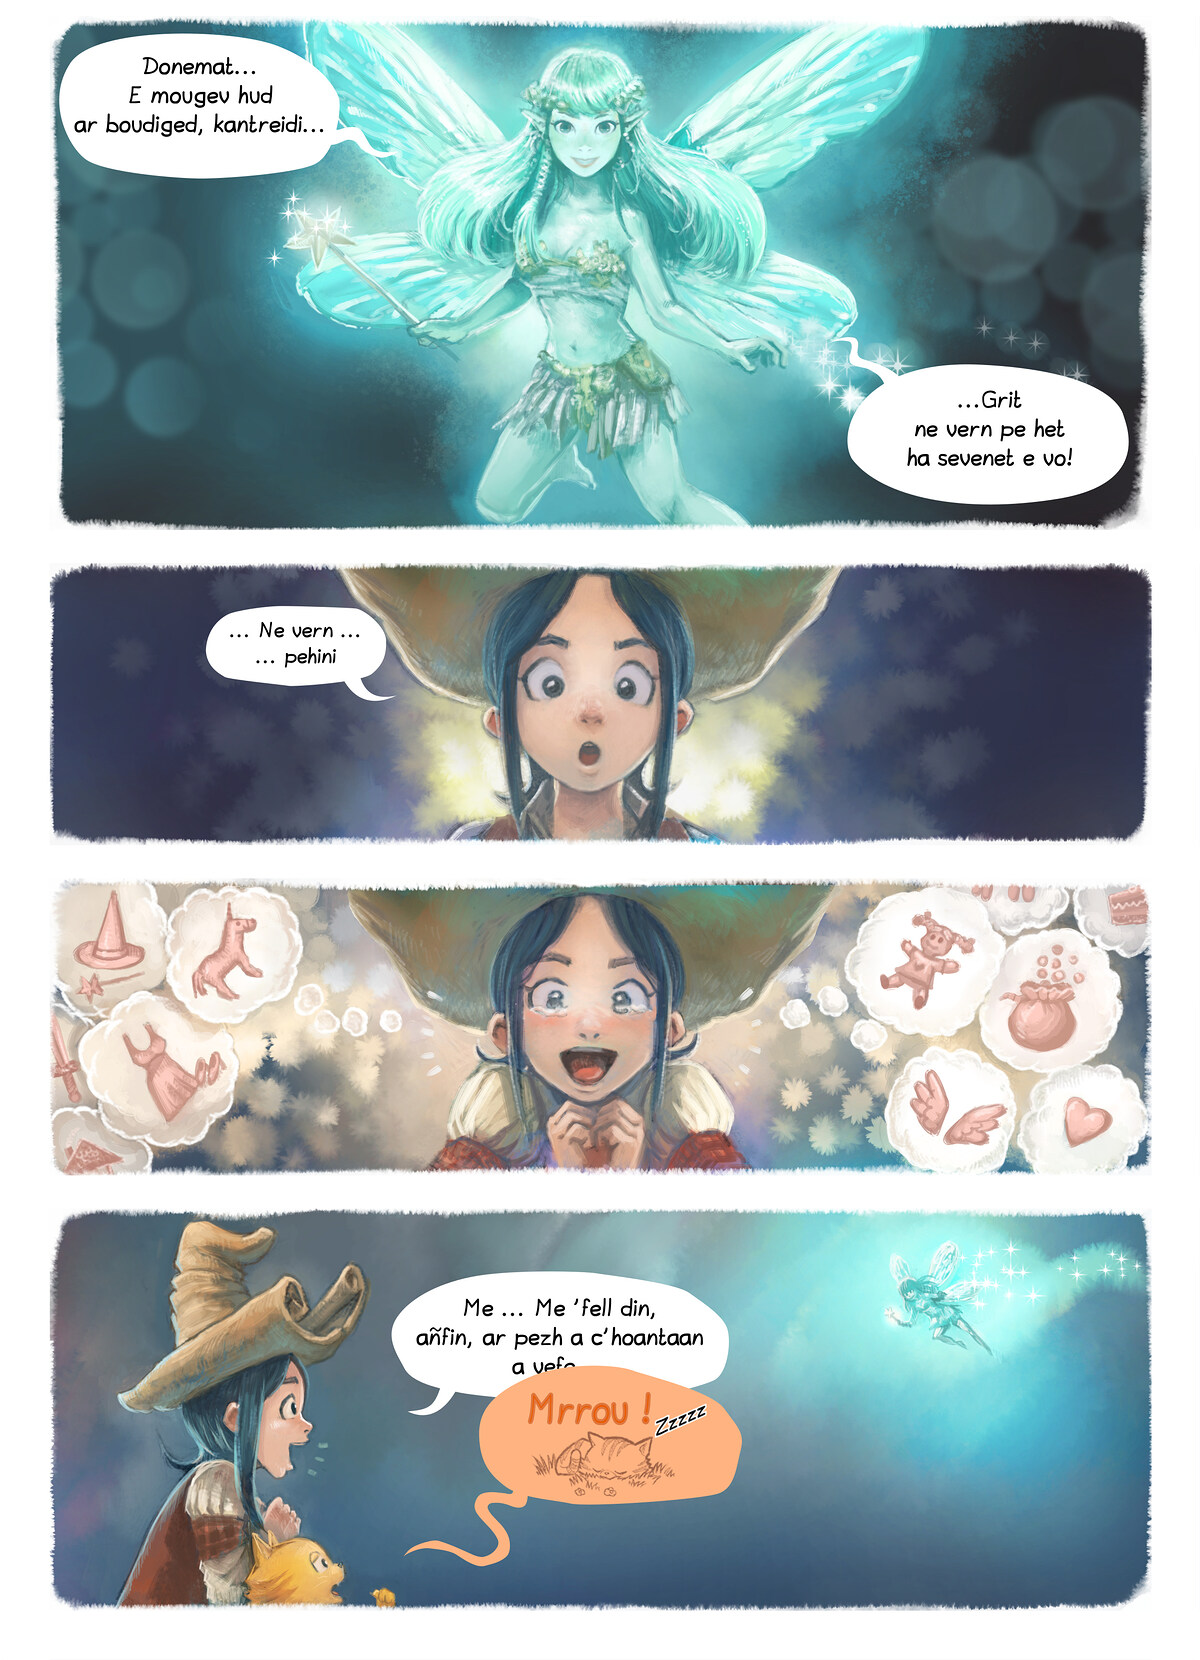 A webcomic page of Pepper&Carrot, rann 7 [br], pajenn 4